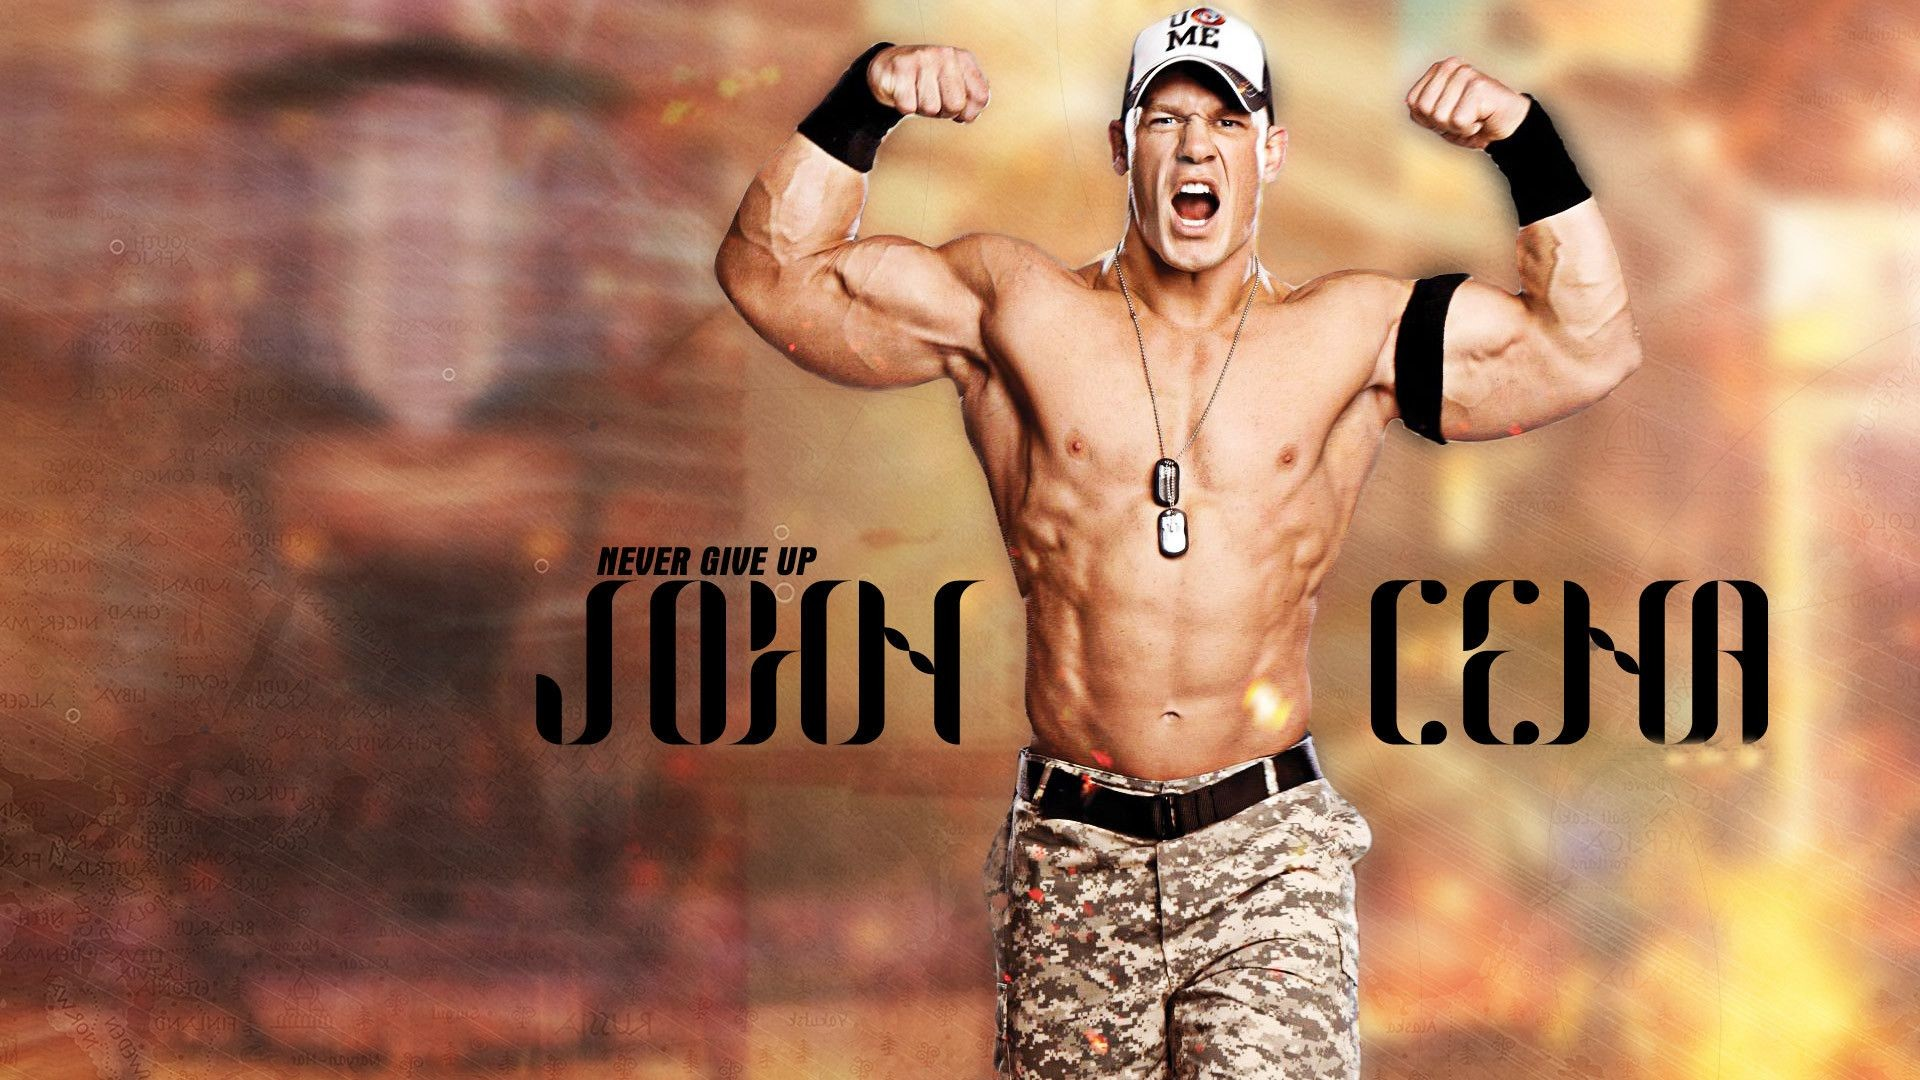 1920x1080 John Cena WWE 2014 Star Wallpaper Wide Or HD